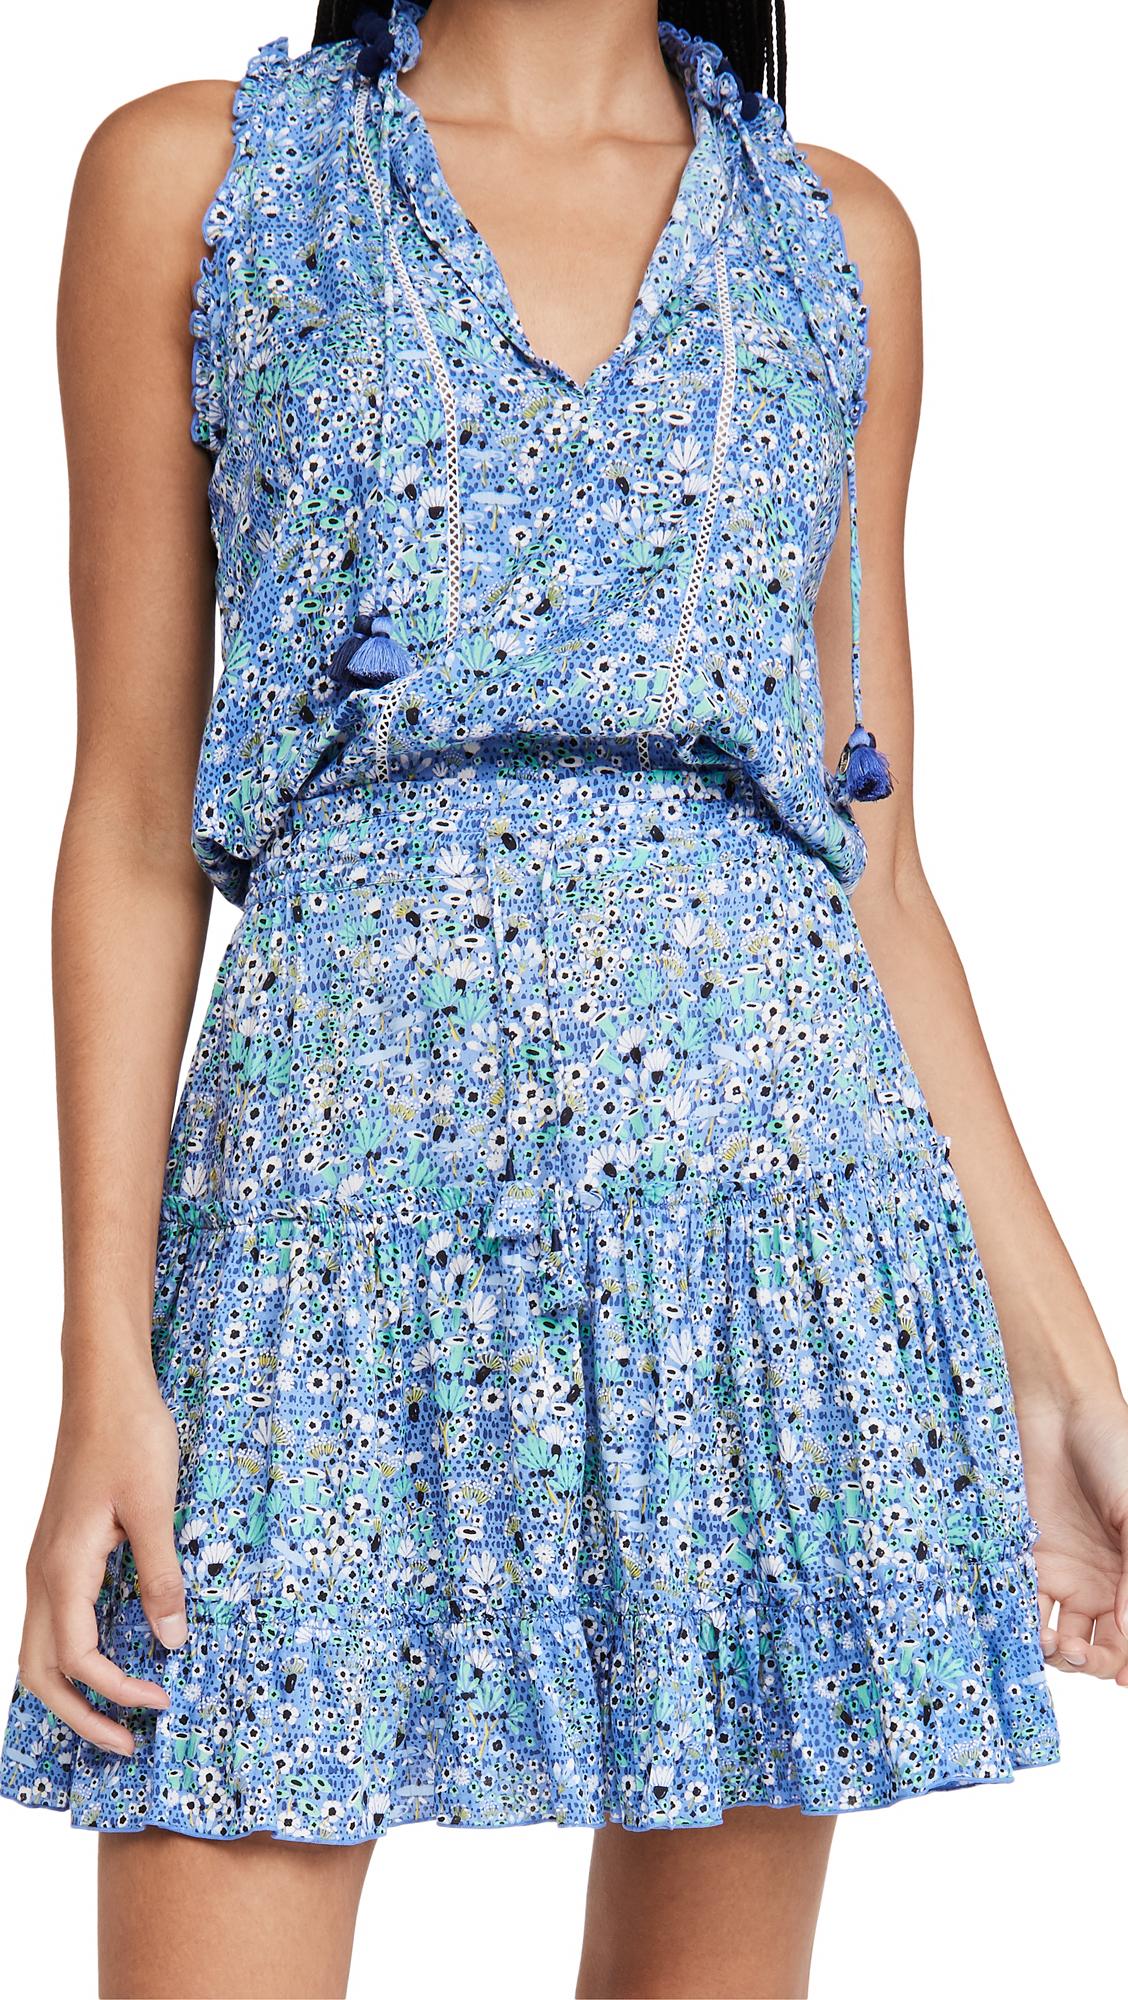 Poupette St Barth Clara Ruffled Mini Dress